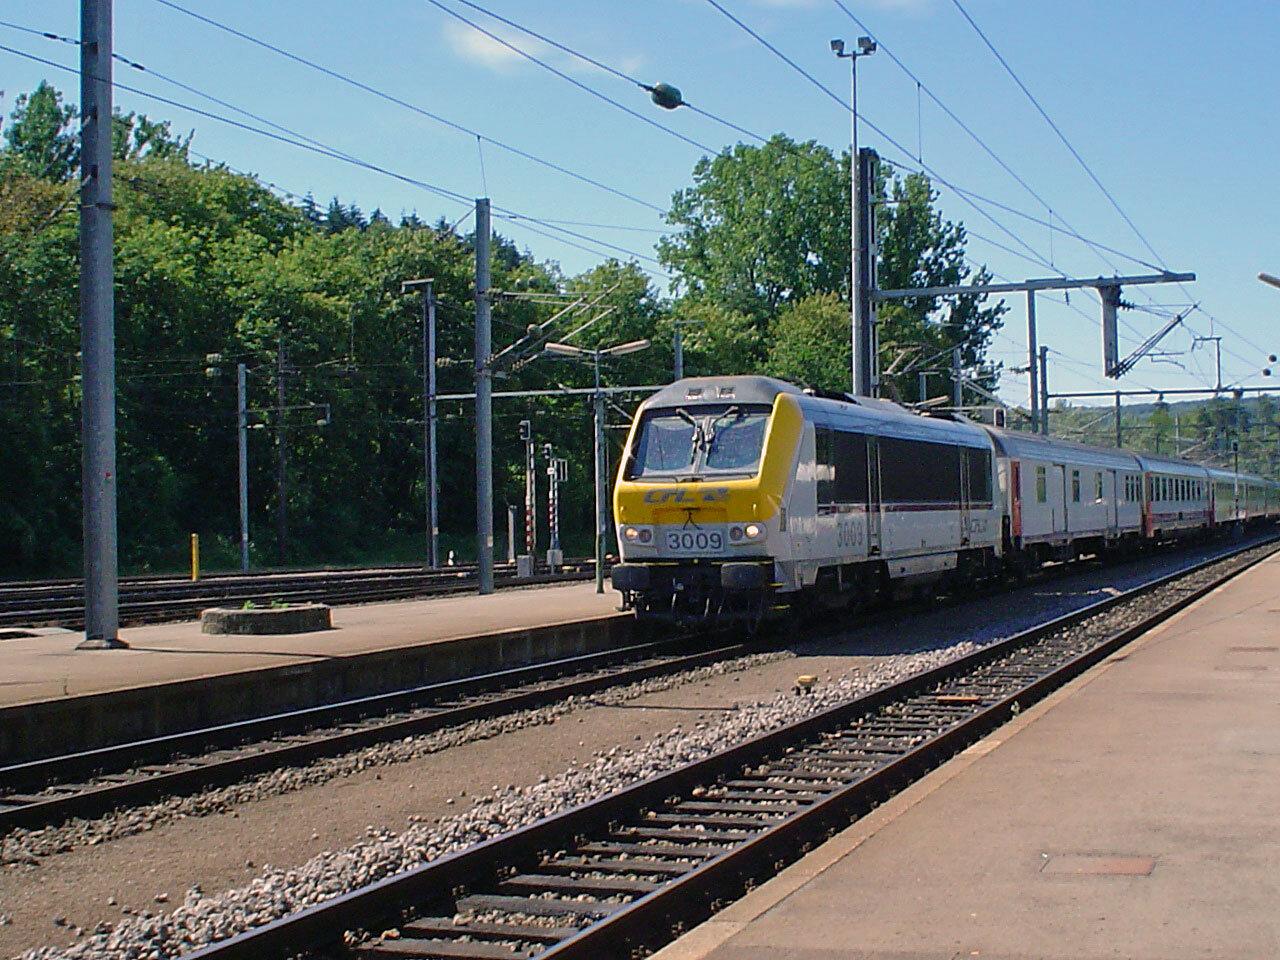 20060718-2